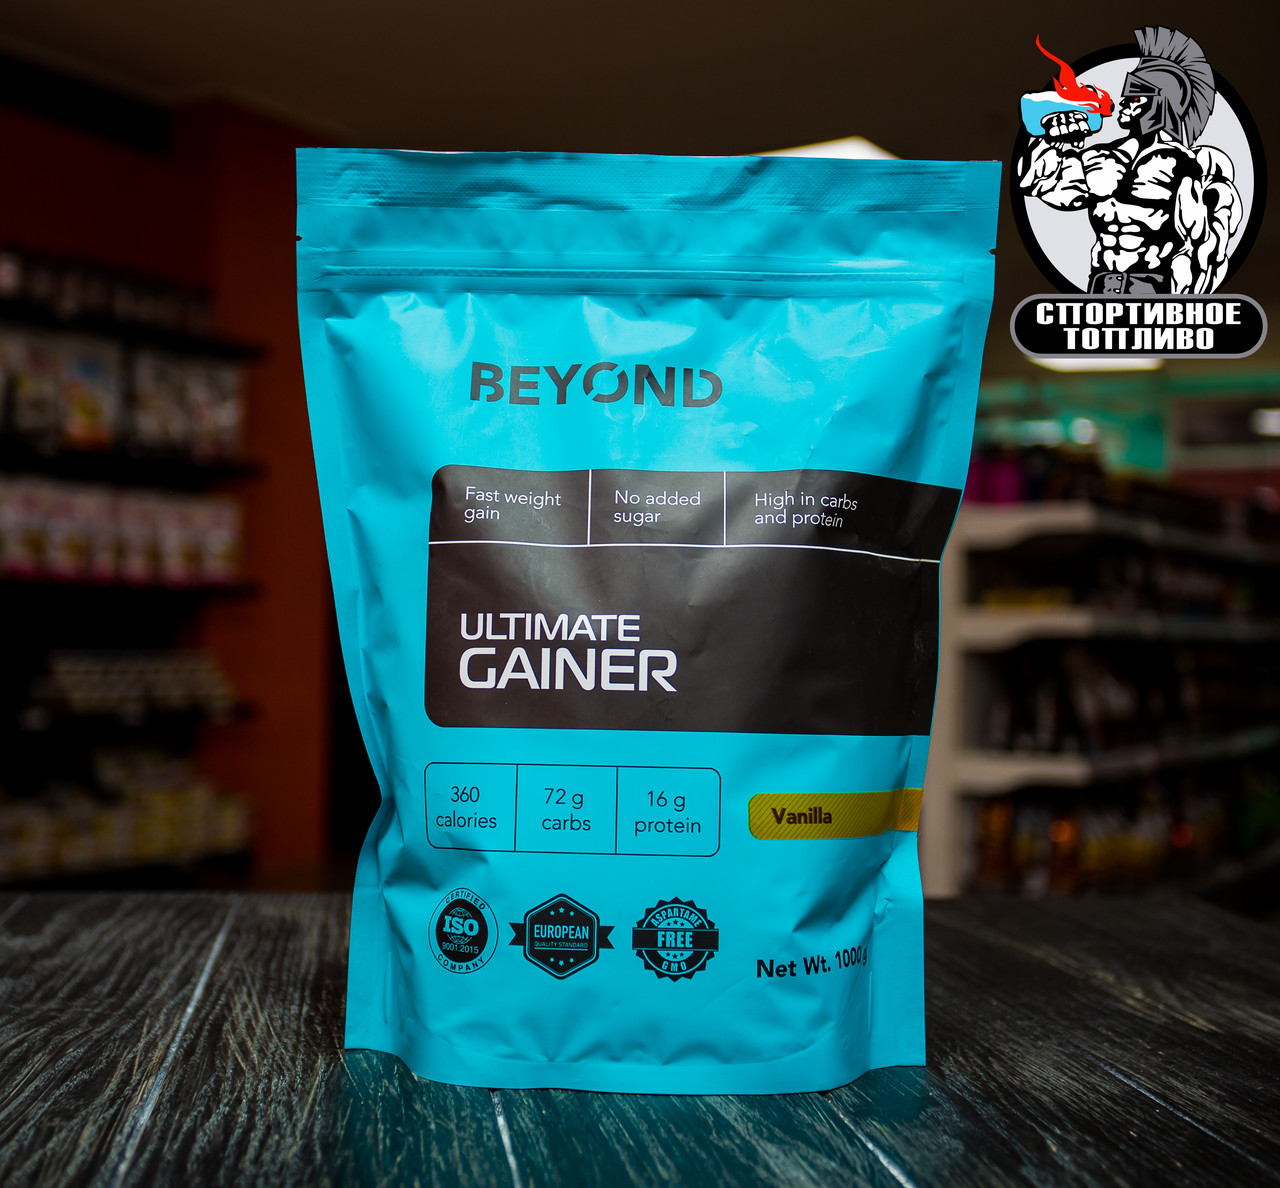 "Гейнер на быстрых углеводах от Beyond ""Ultimate Gainer"" 1000гр/10порций"